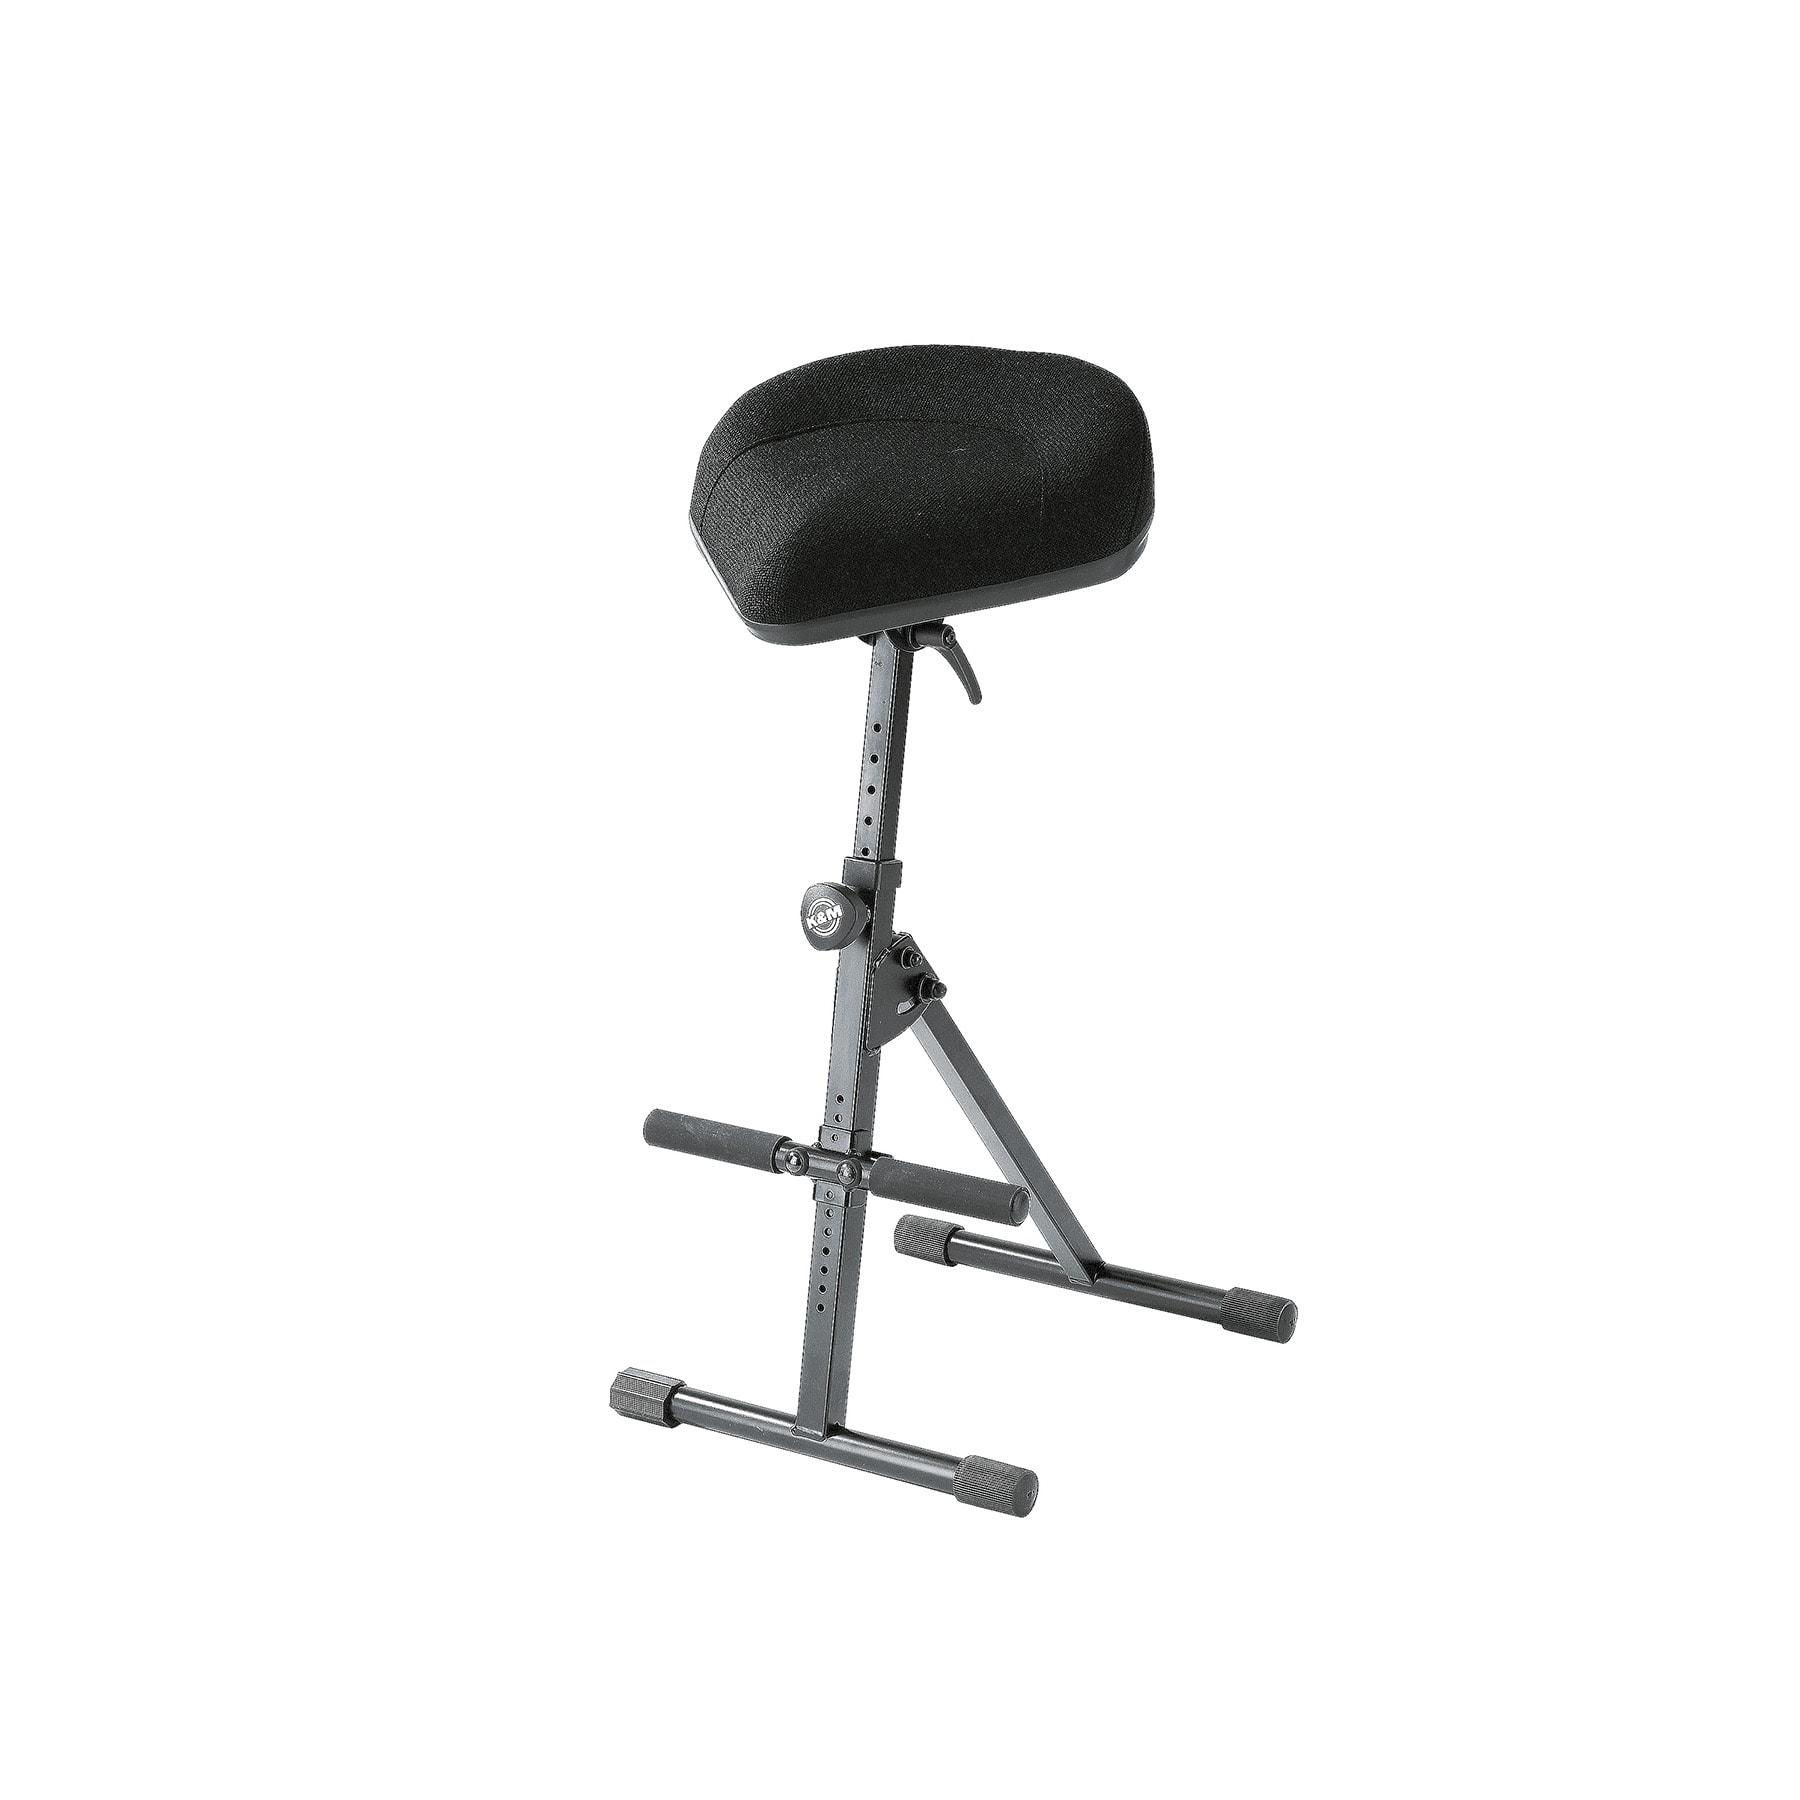 KM14046 - Pneumatic stool